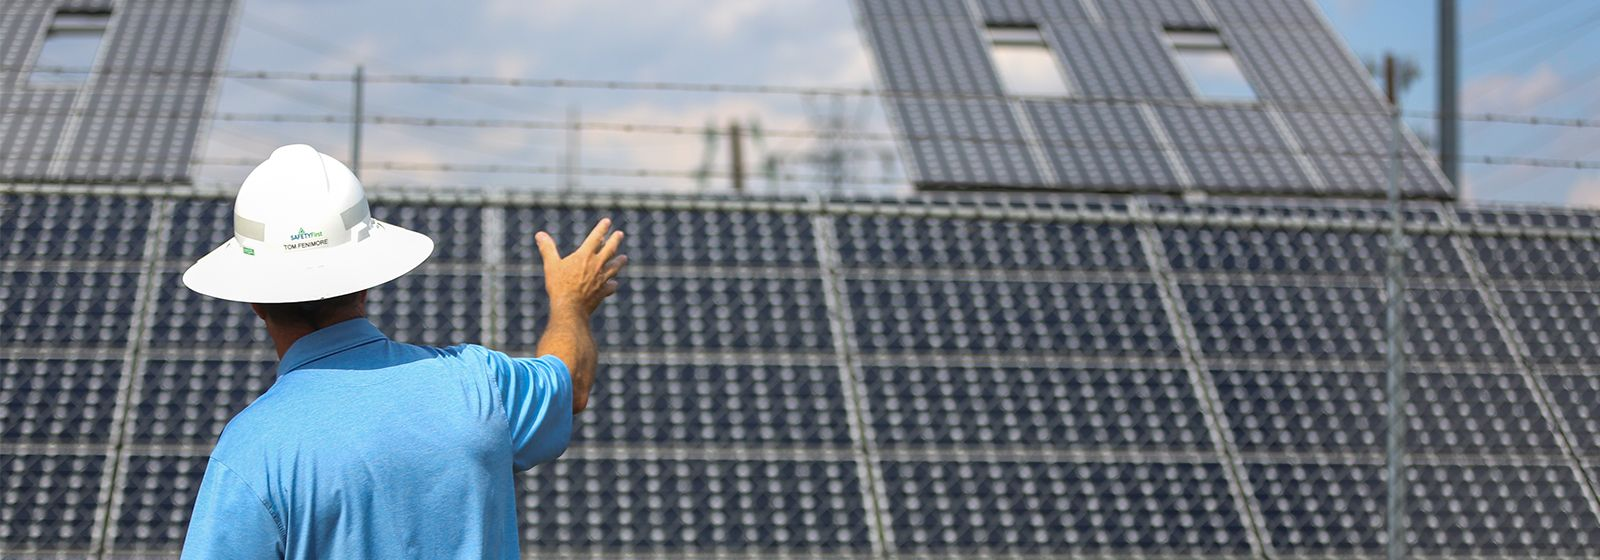 Building a smarter energy grid